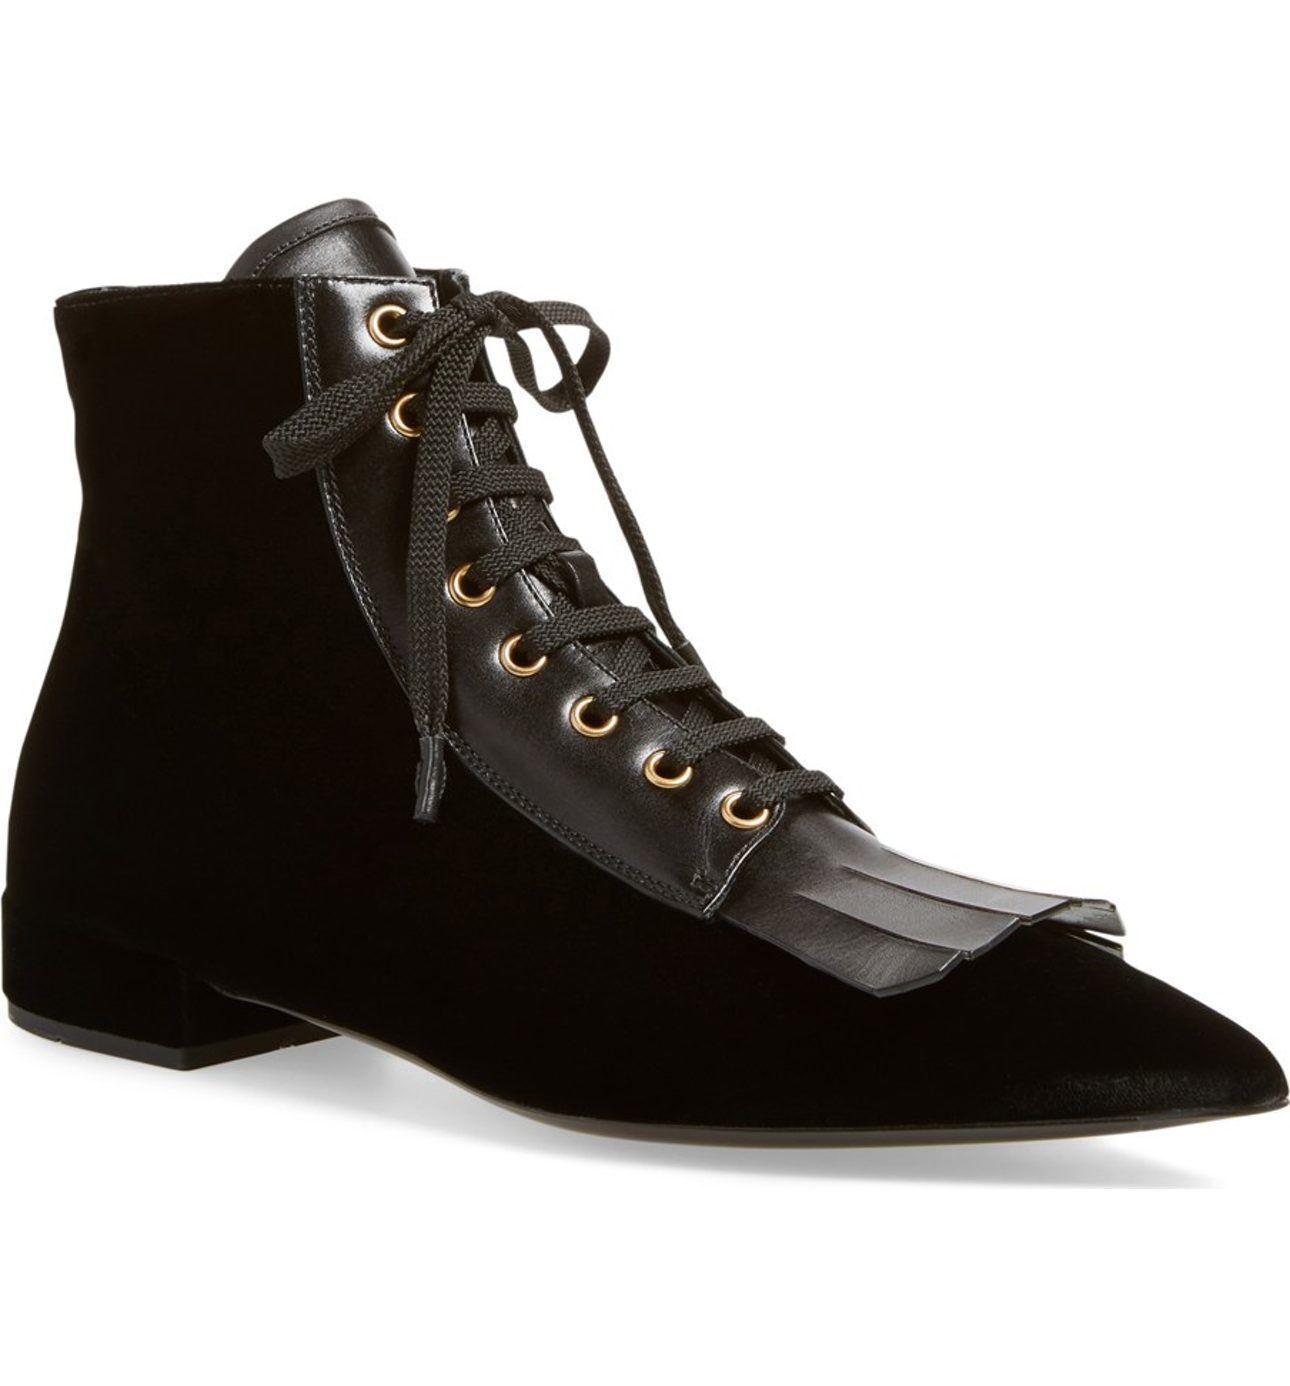 NIB NIB NIB  990+ PRADA KILTIE Lace Up Fringe Ankle Boot Bootie Velvet & Leather 37 - 7 c84b55